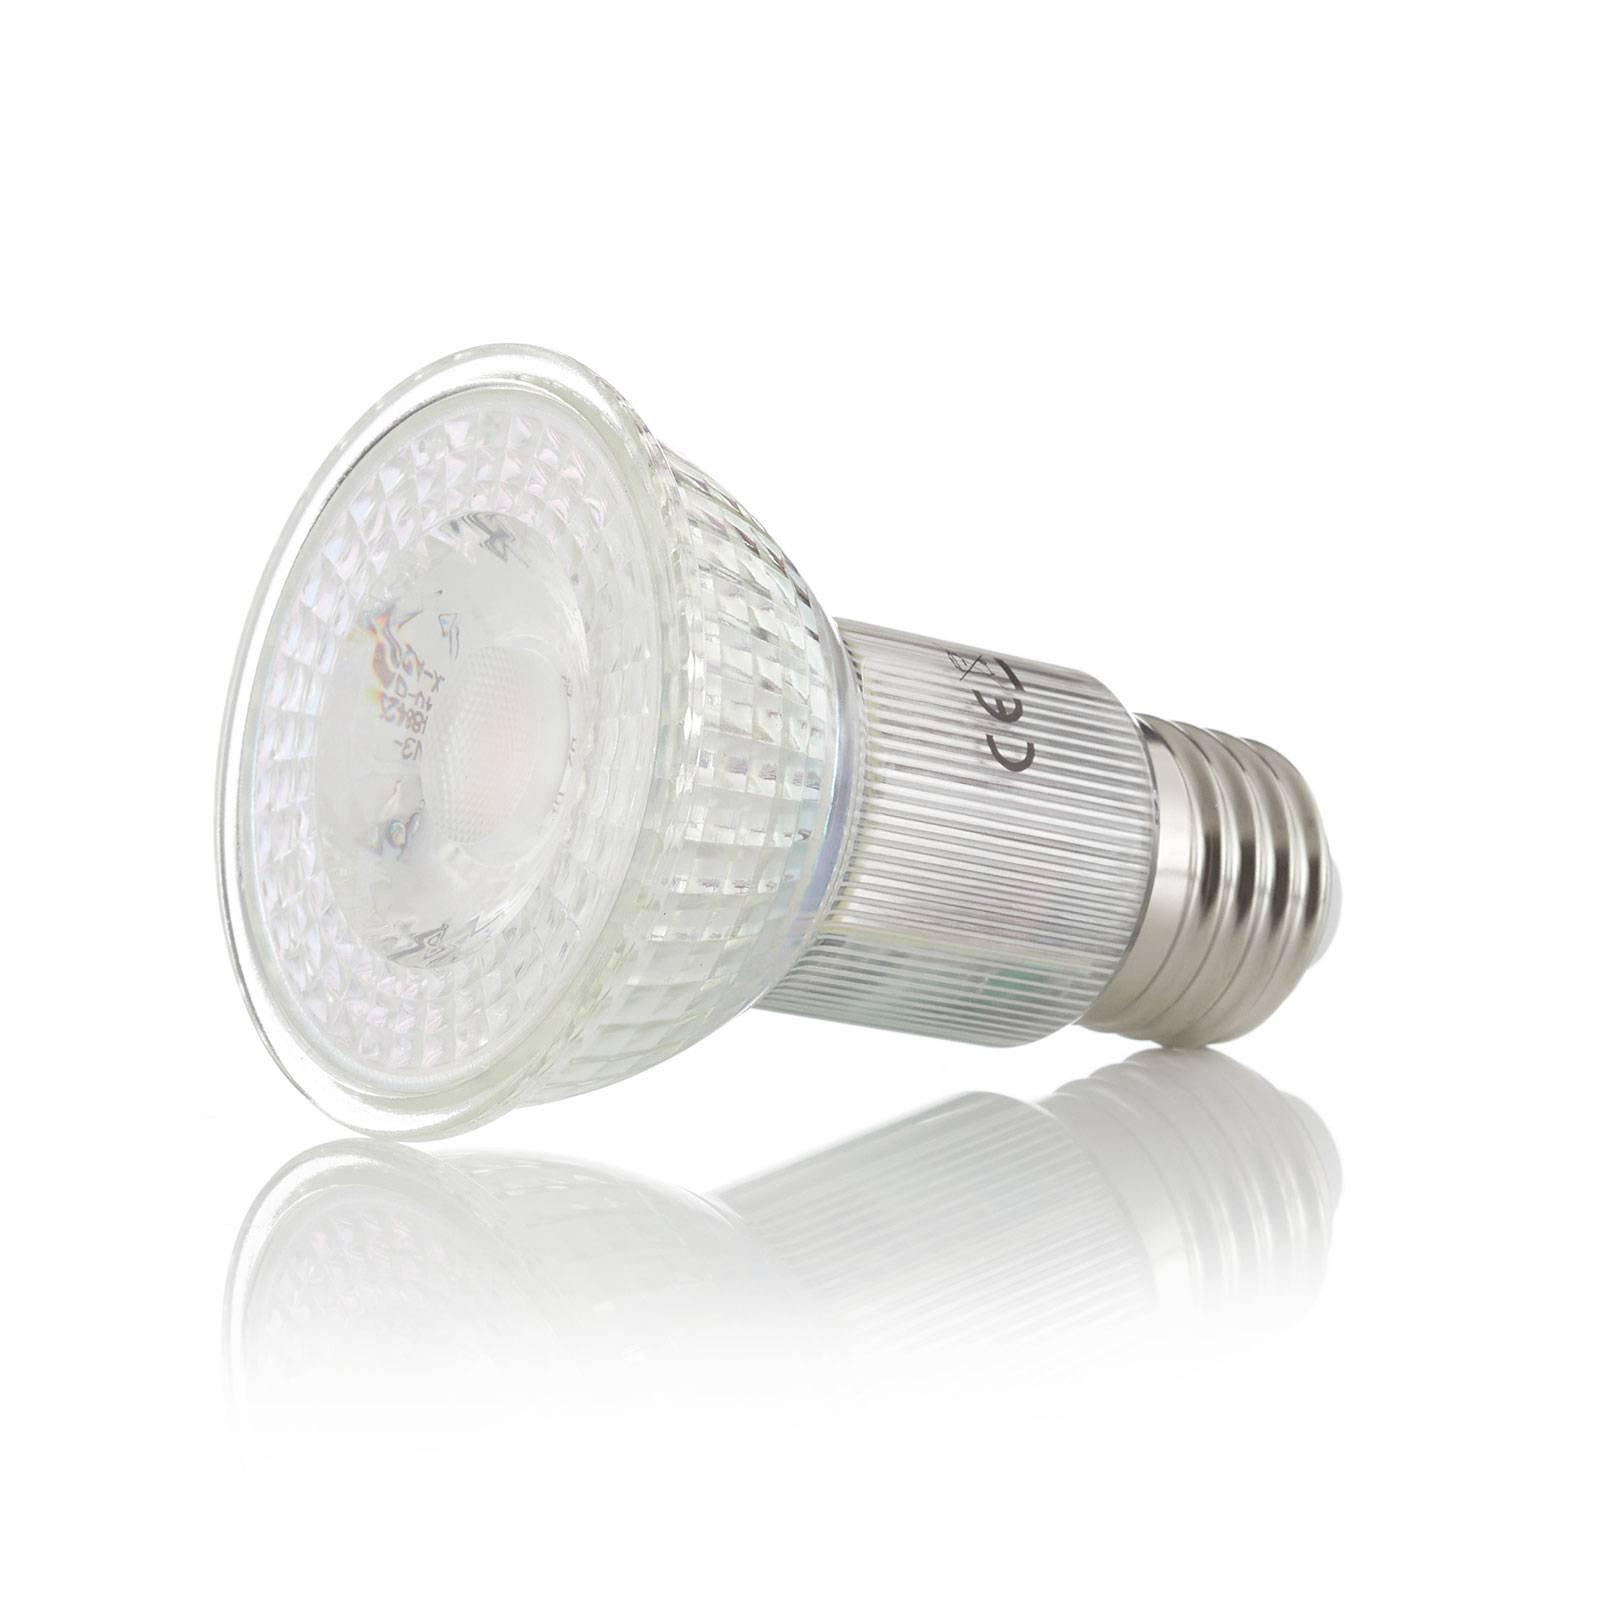 LED-taklampe Bizzo, alu, klarglass